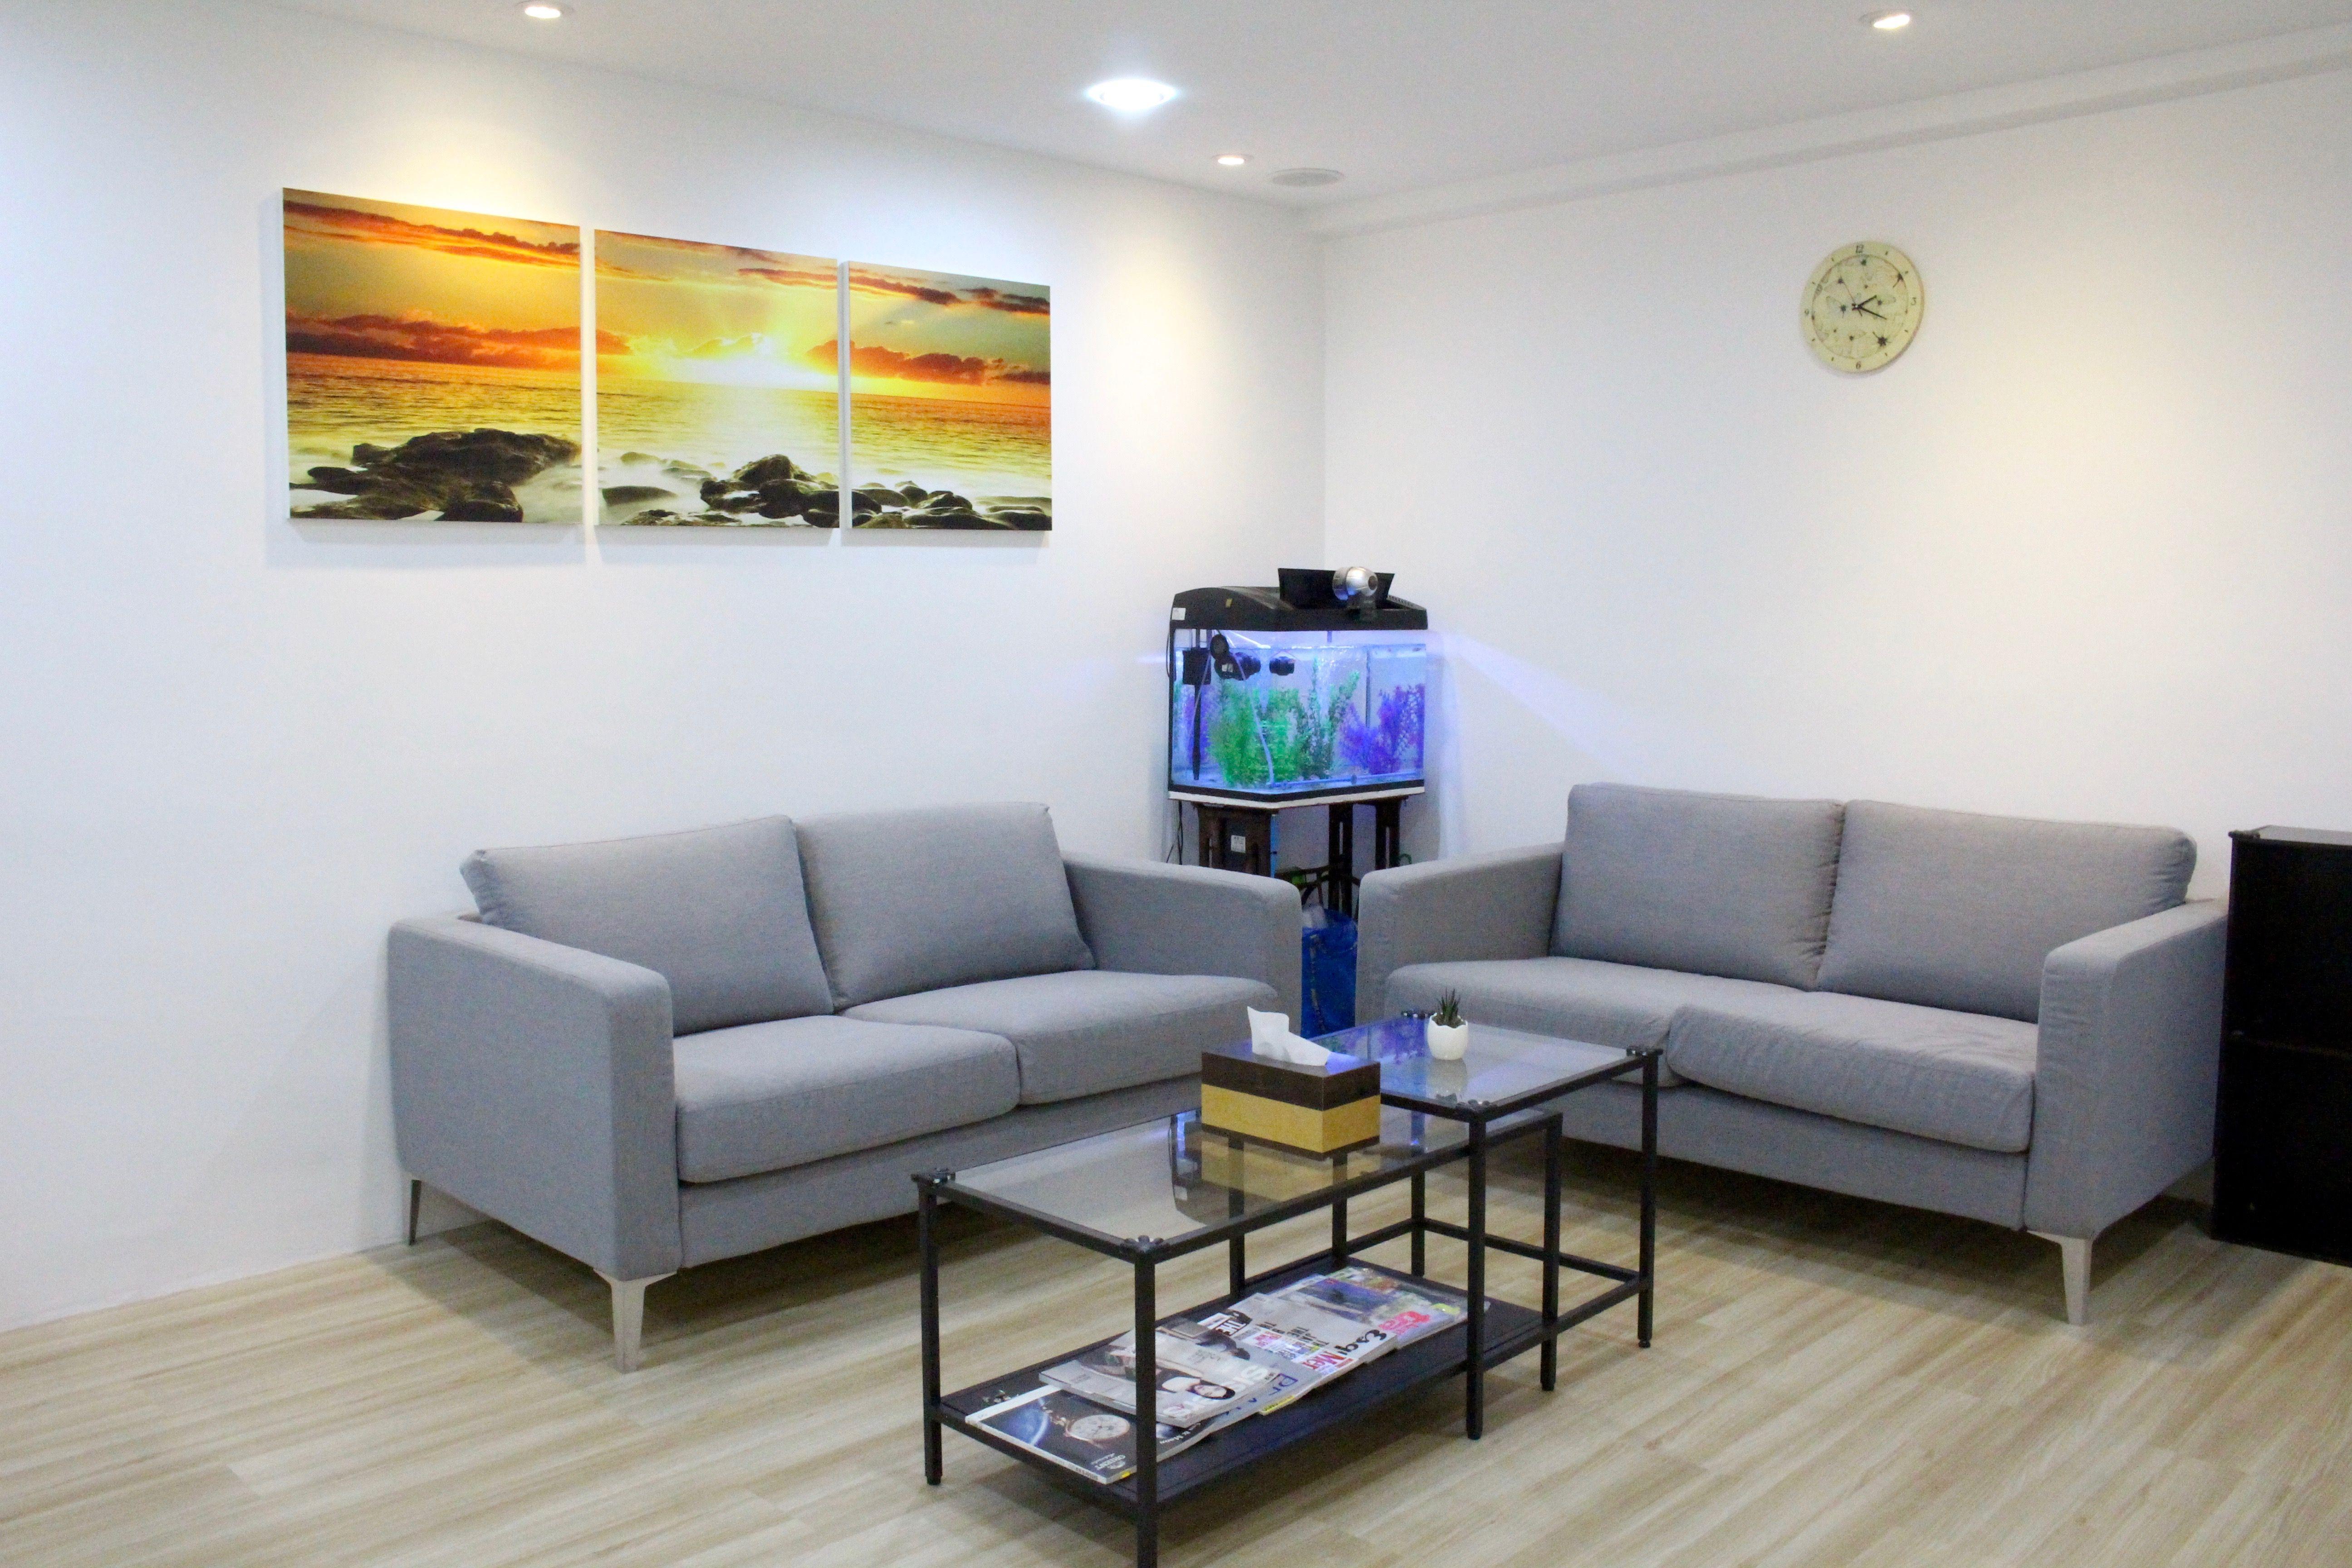 M Dental Clinic Dental clinic, Home decor